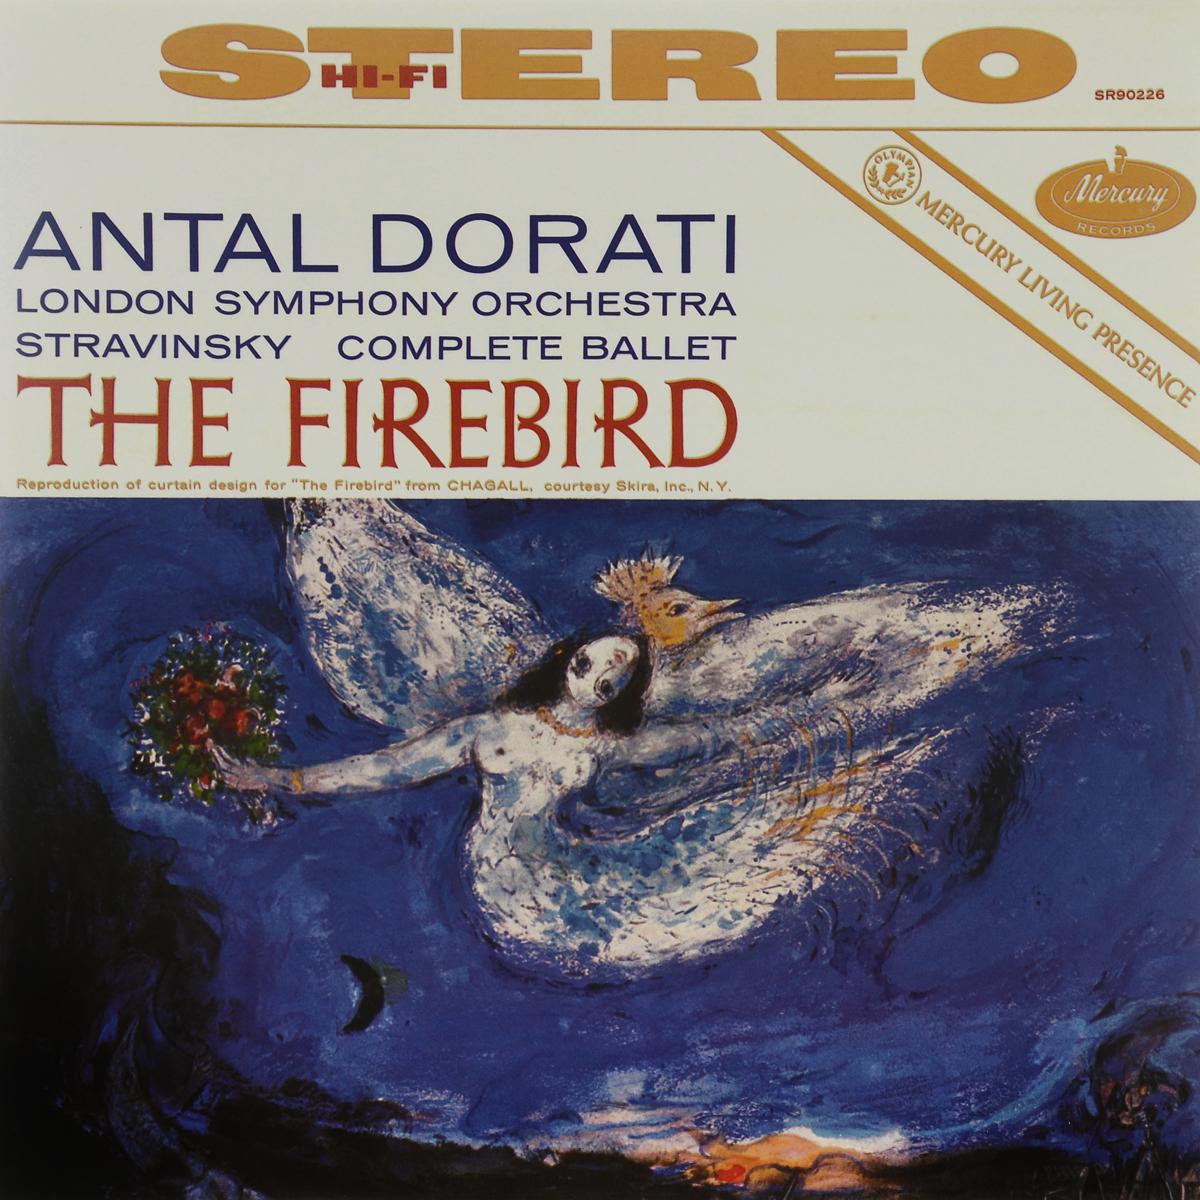 лучшая цена Антал Дорати,The London Symphony Orchestra Antal Dorati. Stravinsky. The Firebird (LP)